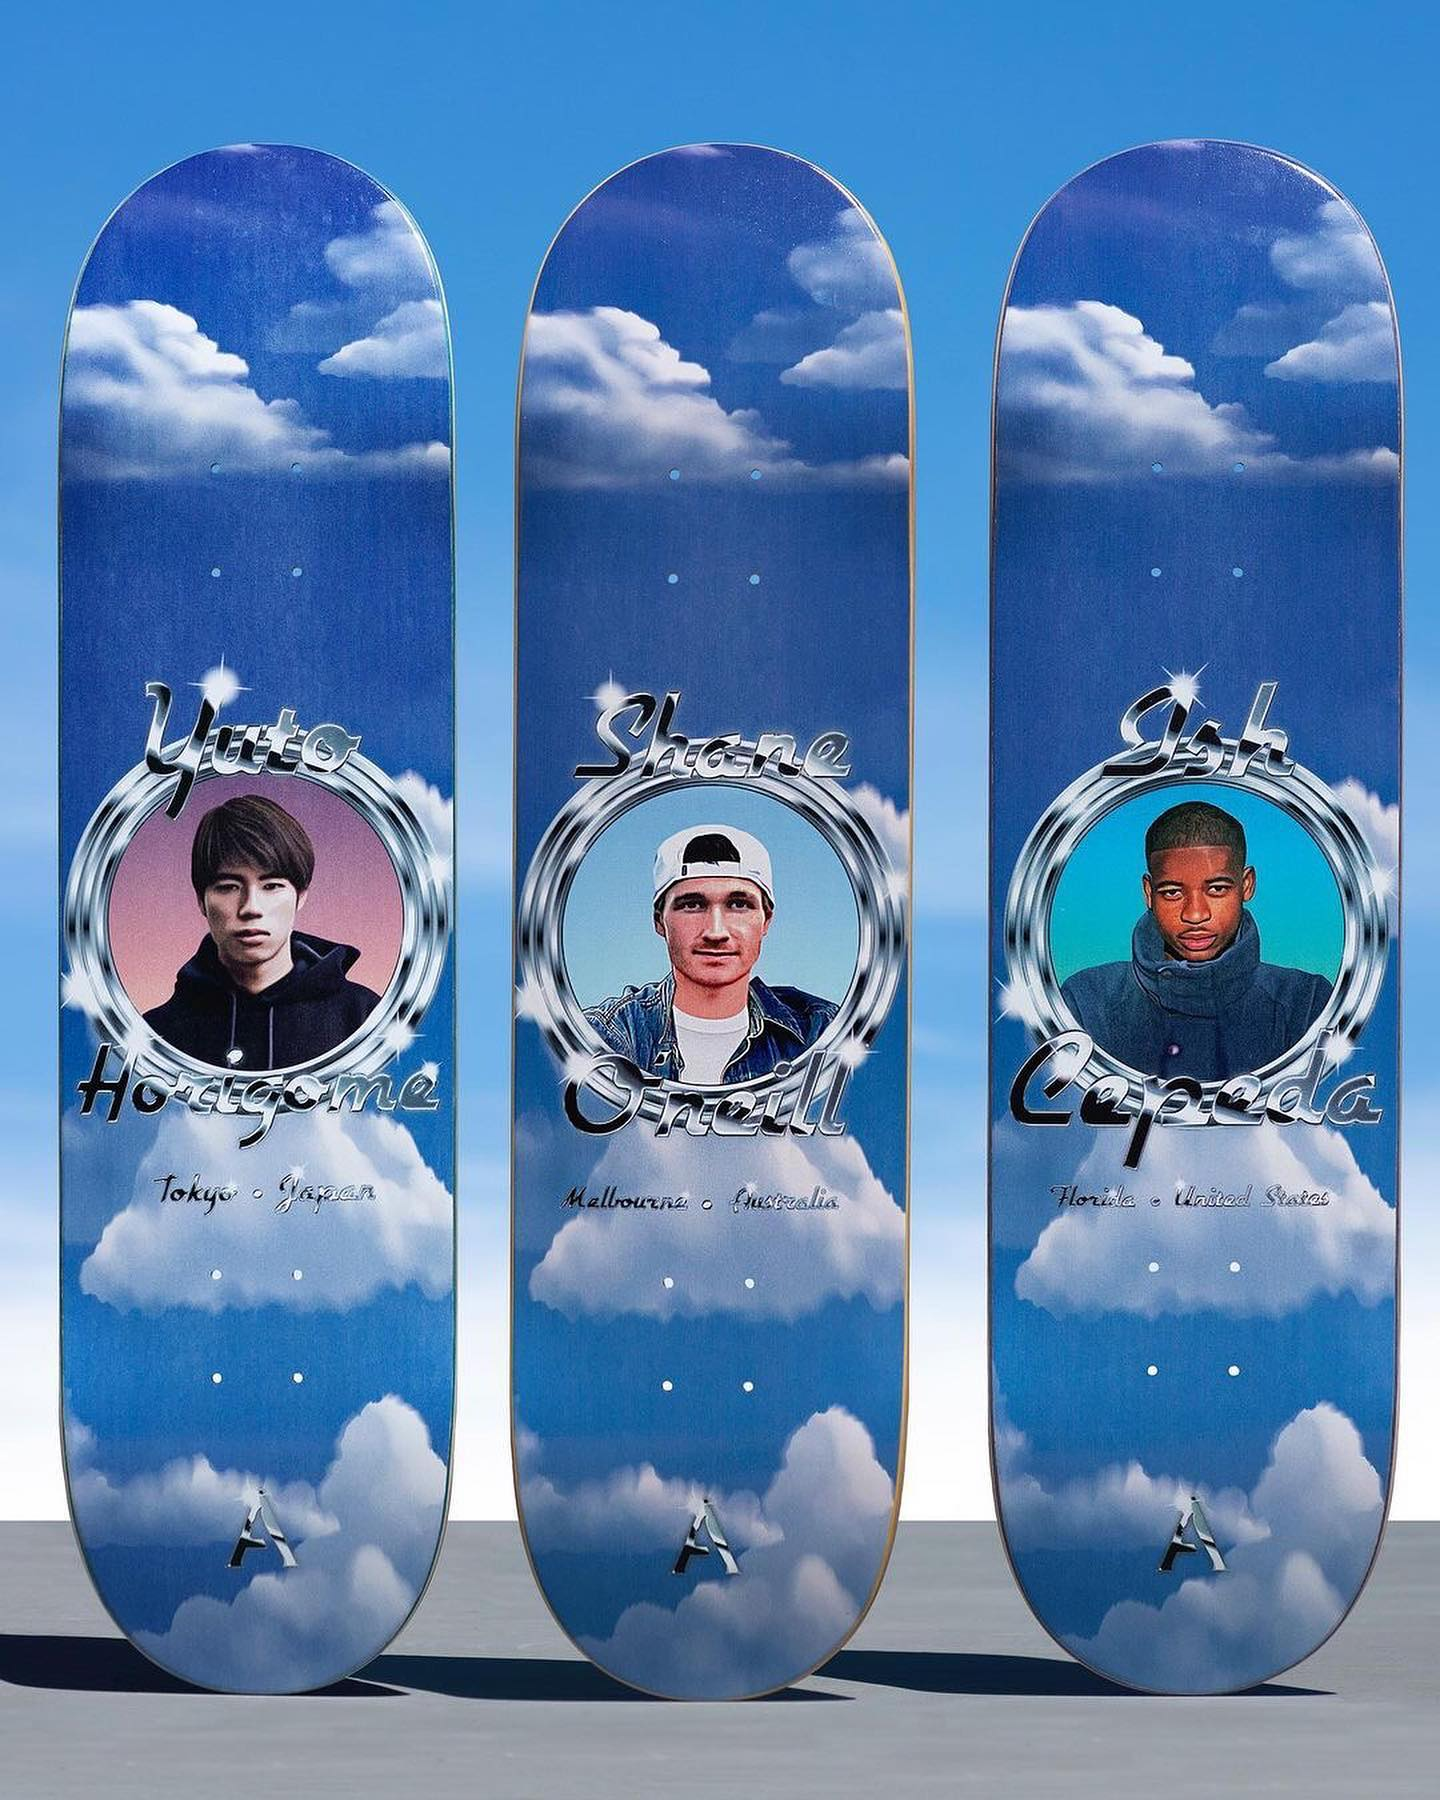 8月29日(日)PM12:00発売New @aprilskateboards decks.